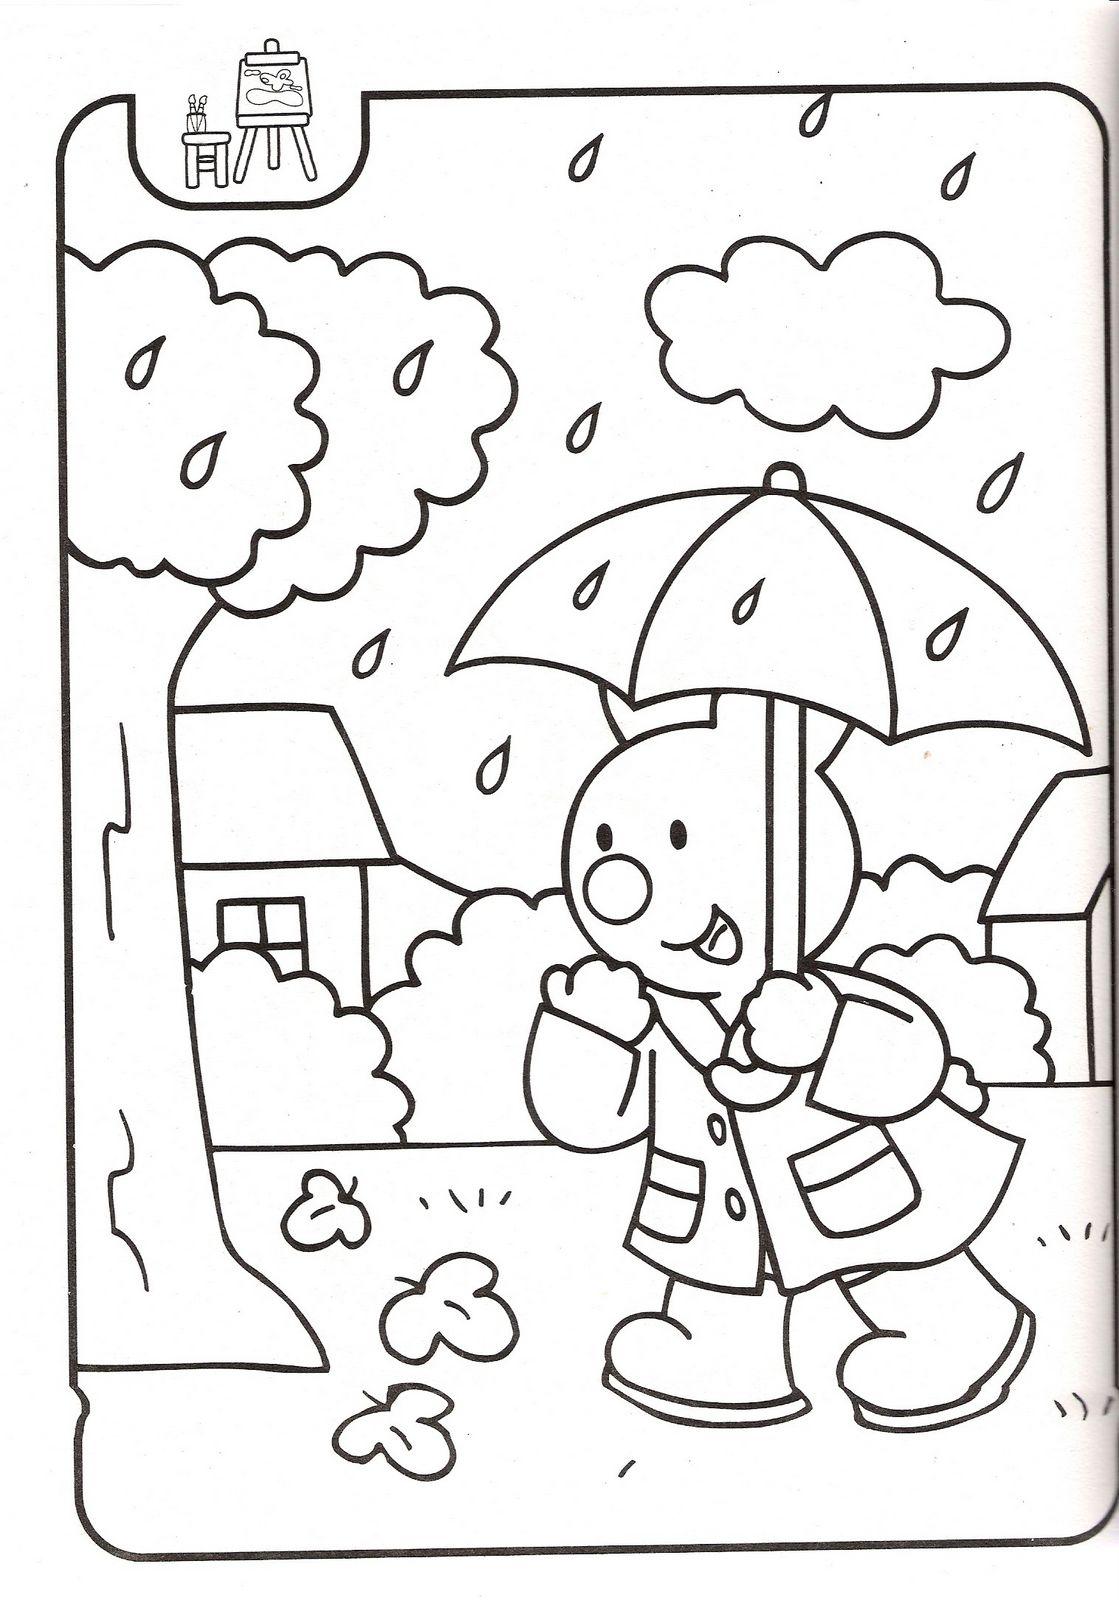 Perfecto Día Lluvioso Para Colorear Para Preescolares Galería ...